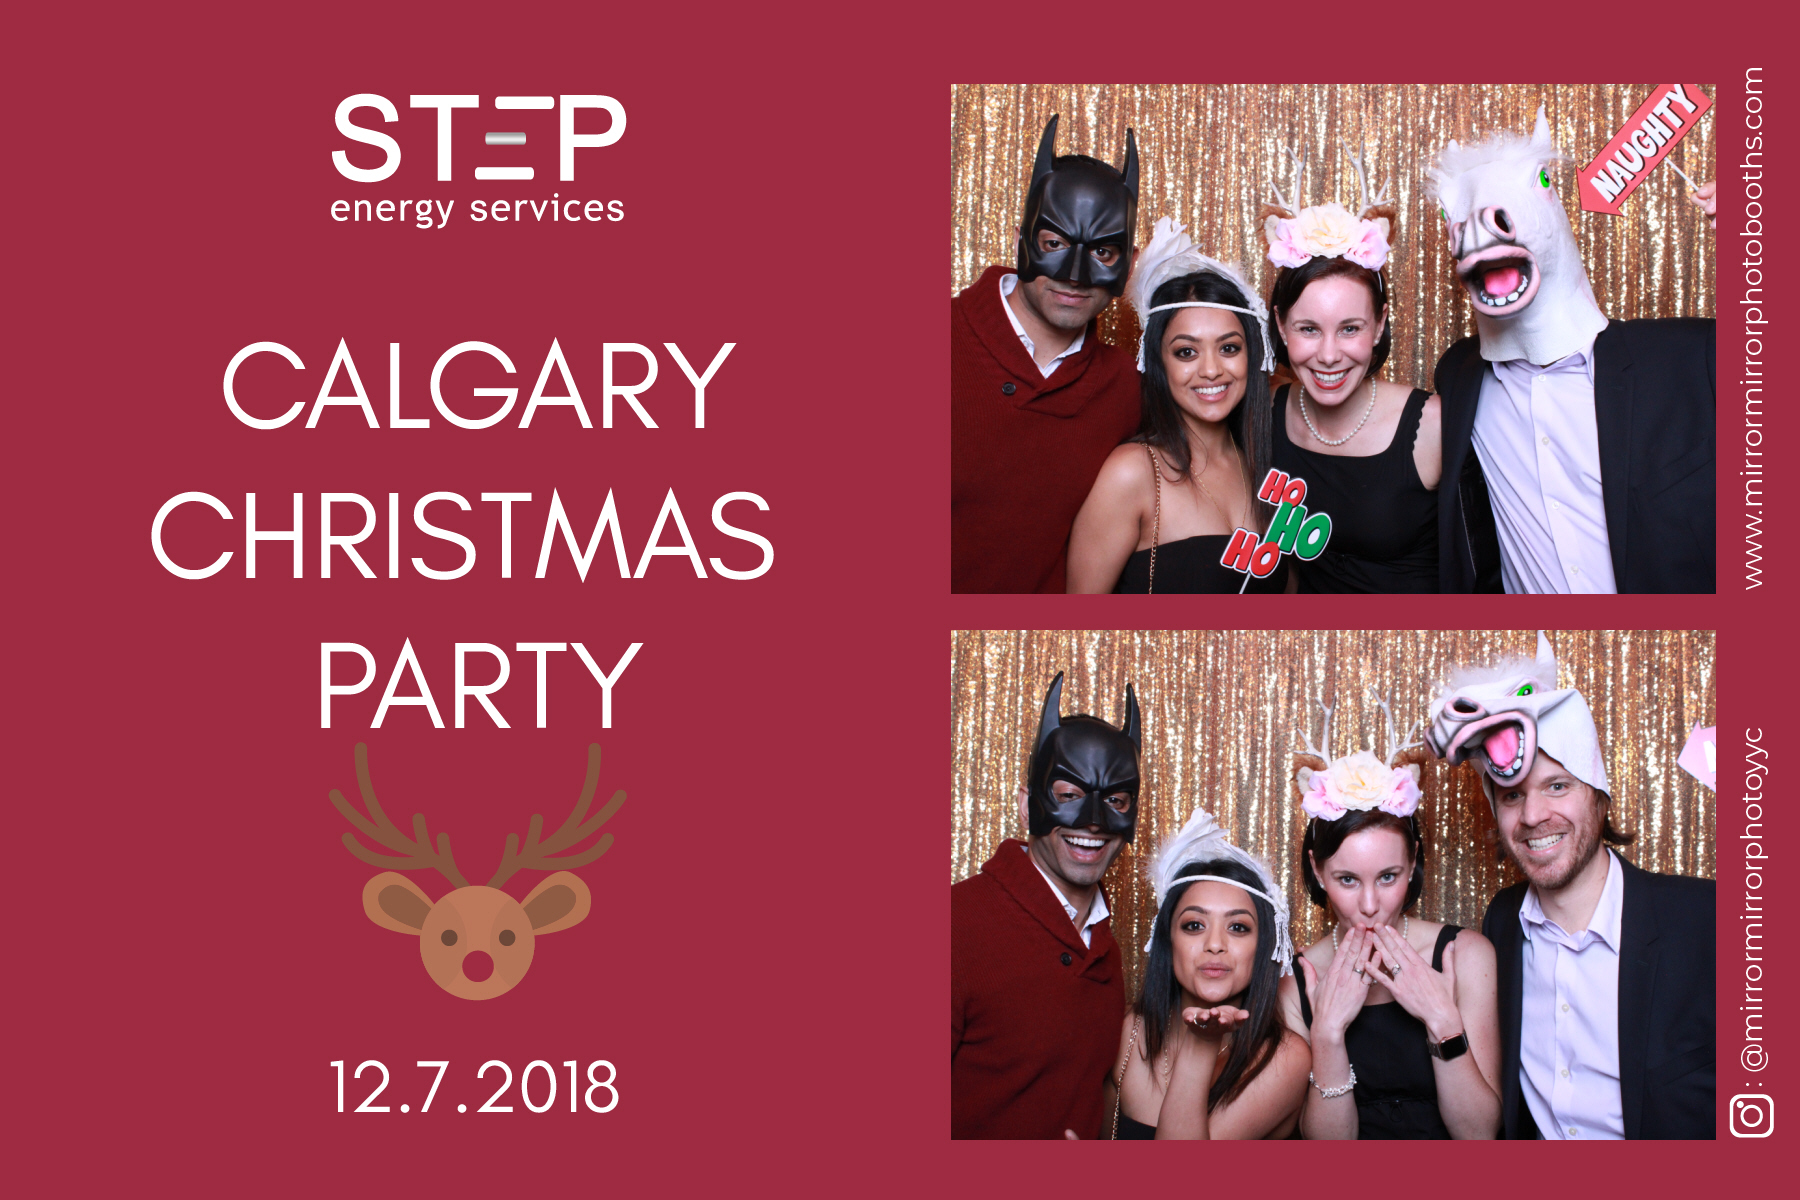 STEP Christmas Party - Dec 7, 2018